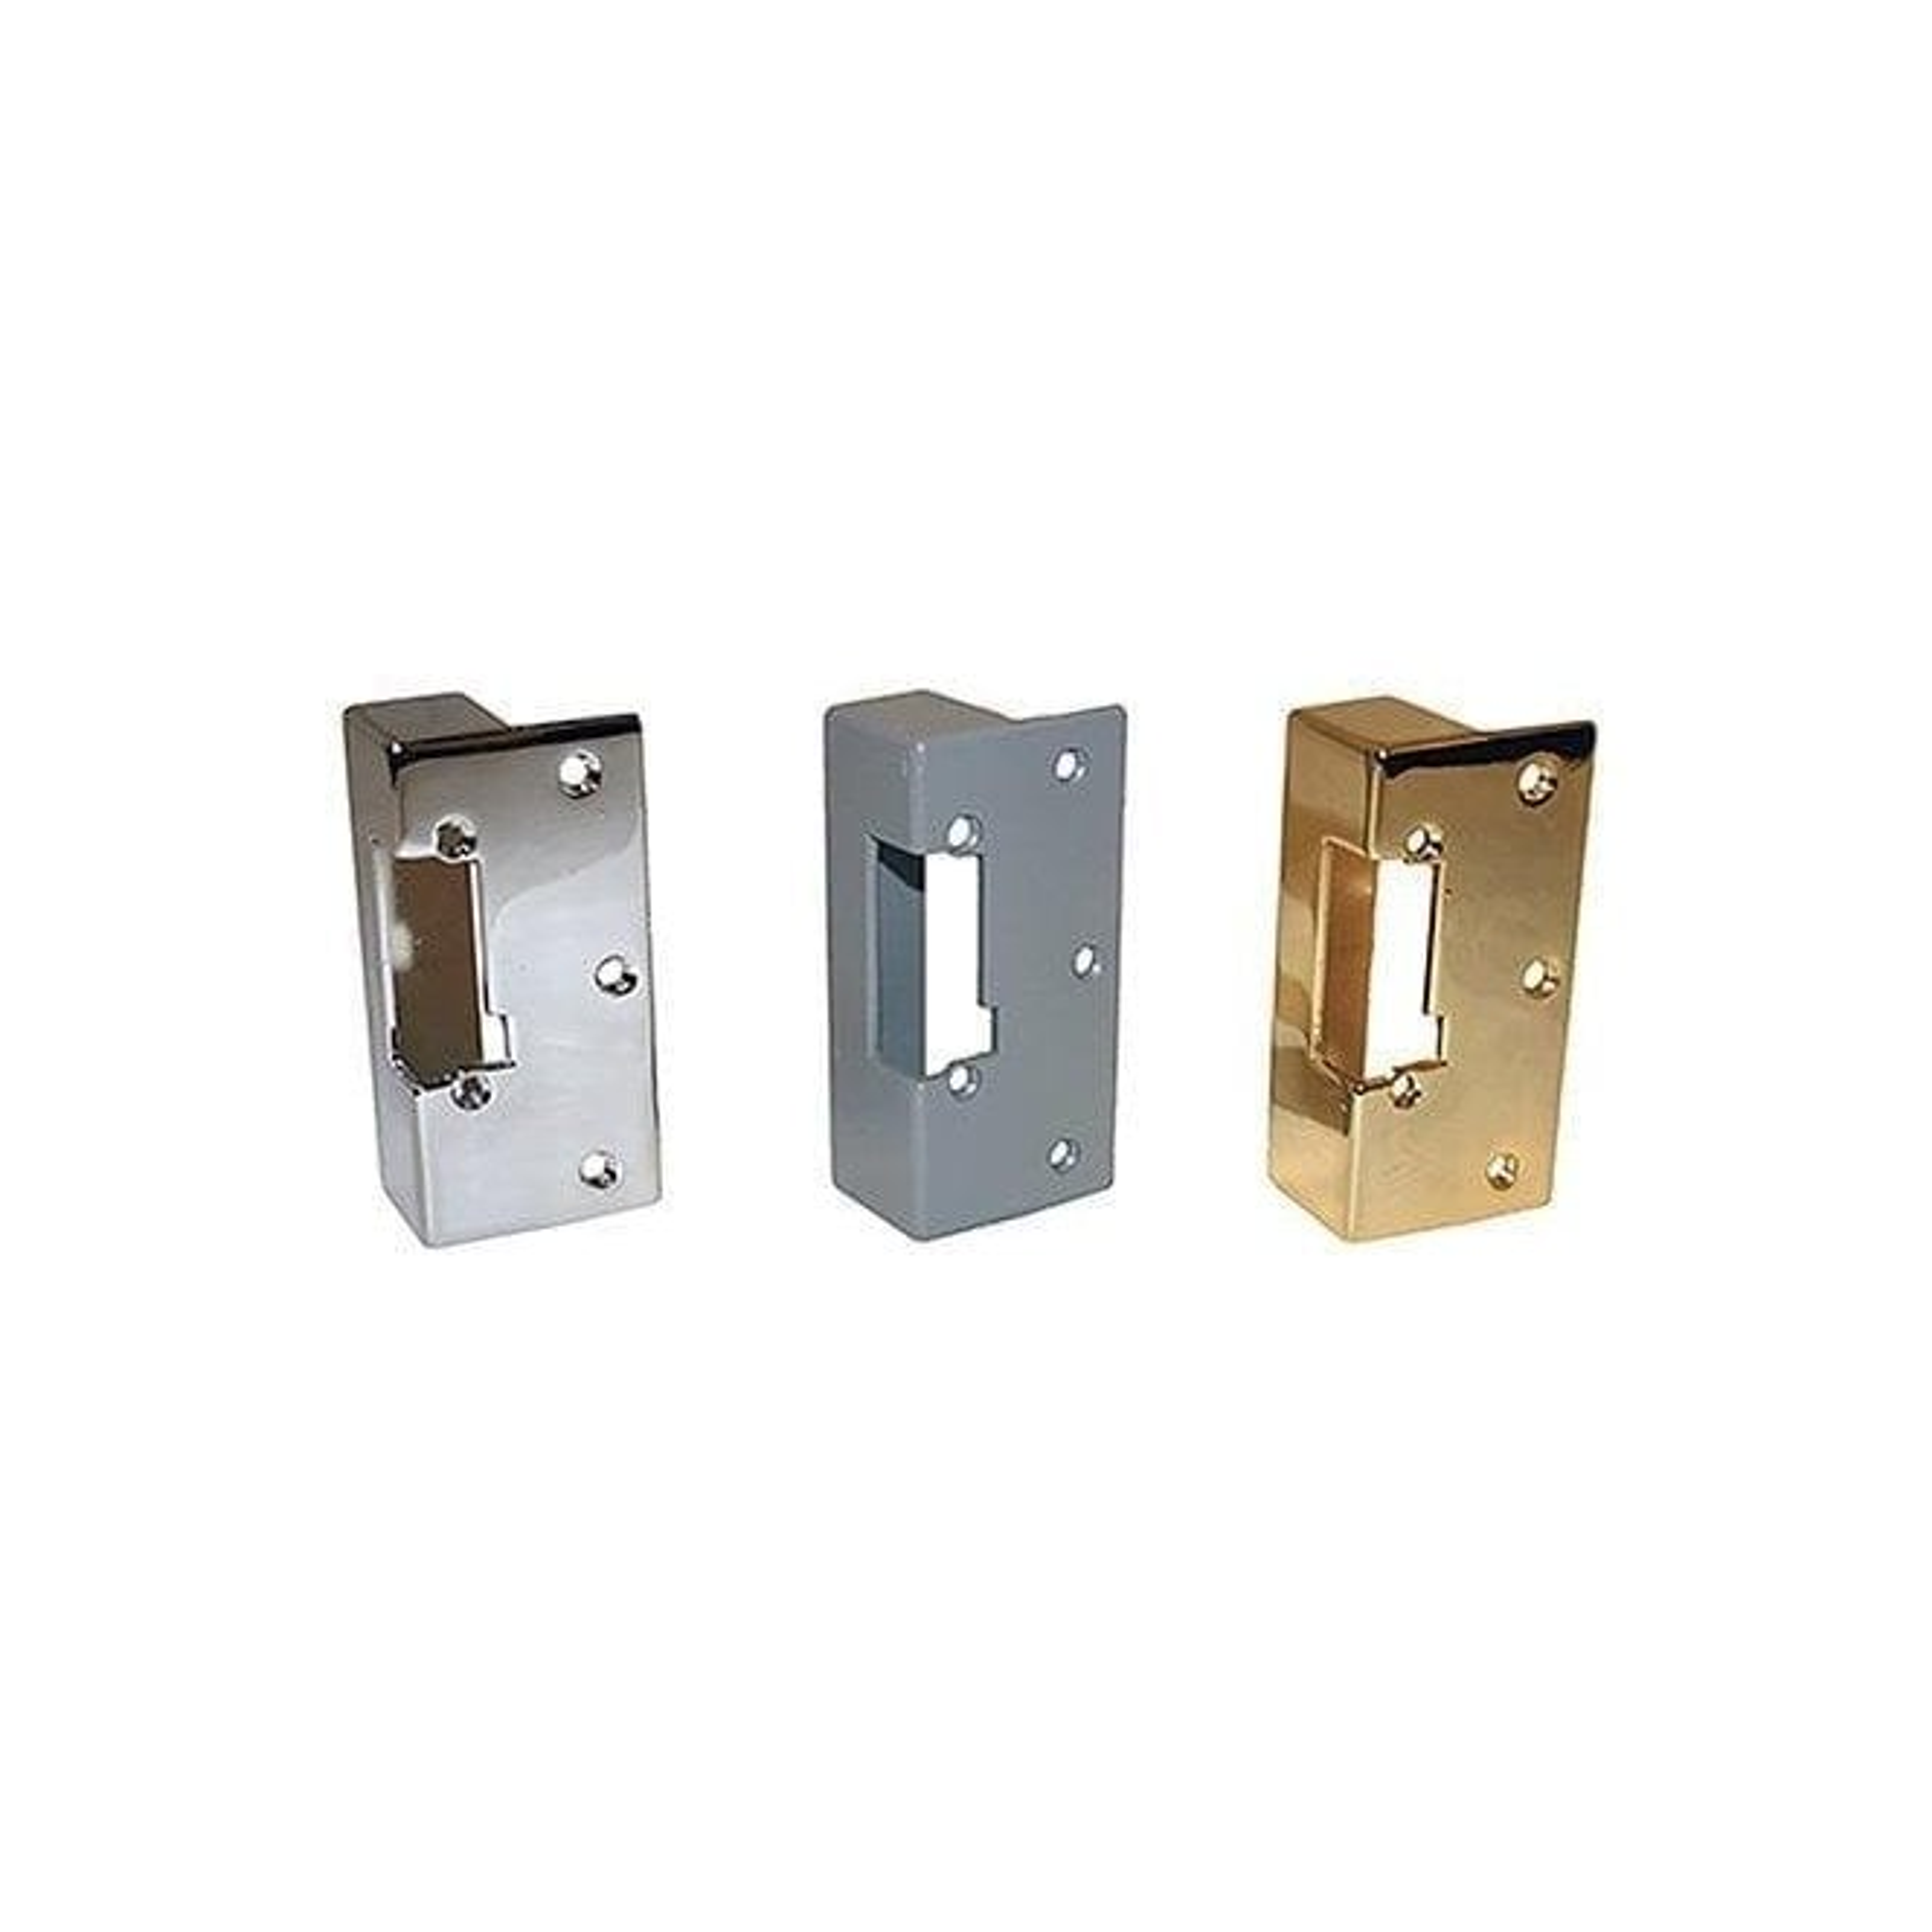 CDVI Brass Surface Rim Case for Outward Opening Door